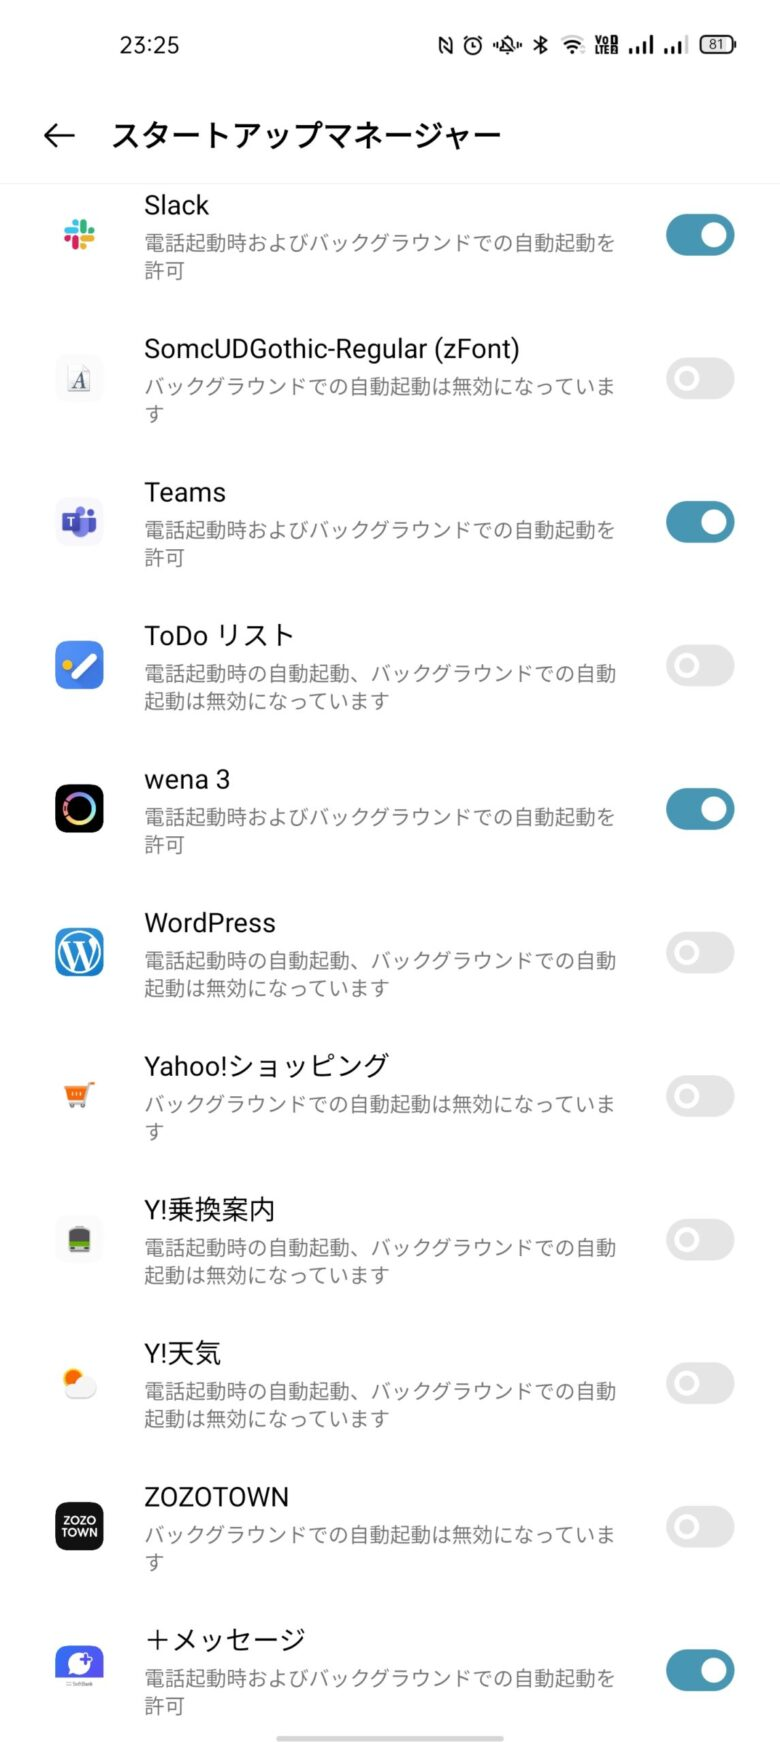 OPPO Find X3 Proの通知設定その2。アプリの自動起動の設定画面です。各アプリの個別設定です。